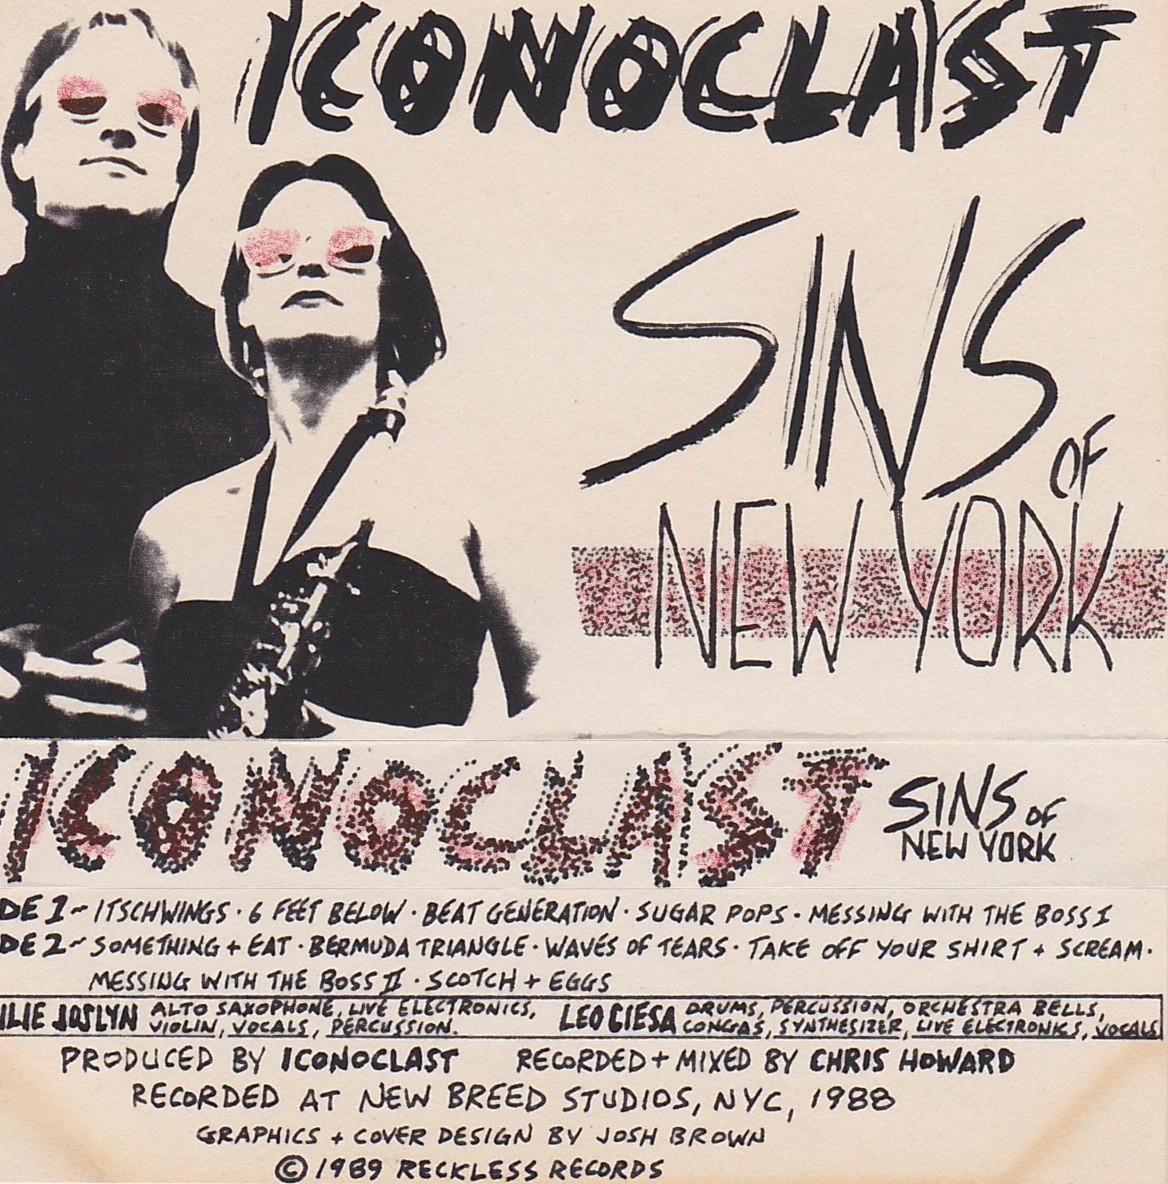 Iconoclast: Sins of New York, 1989